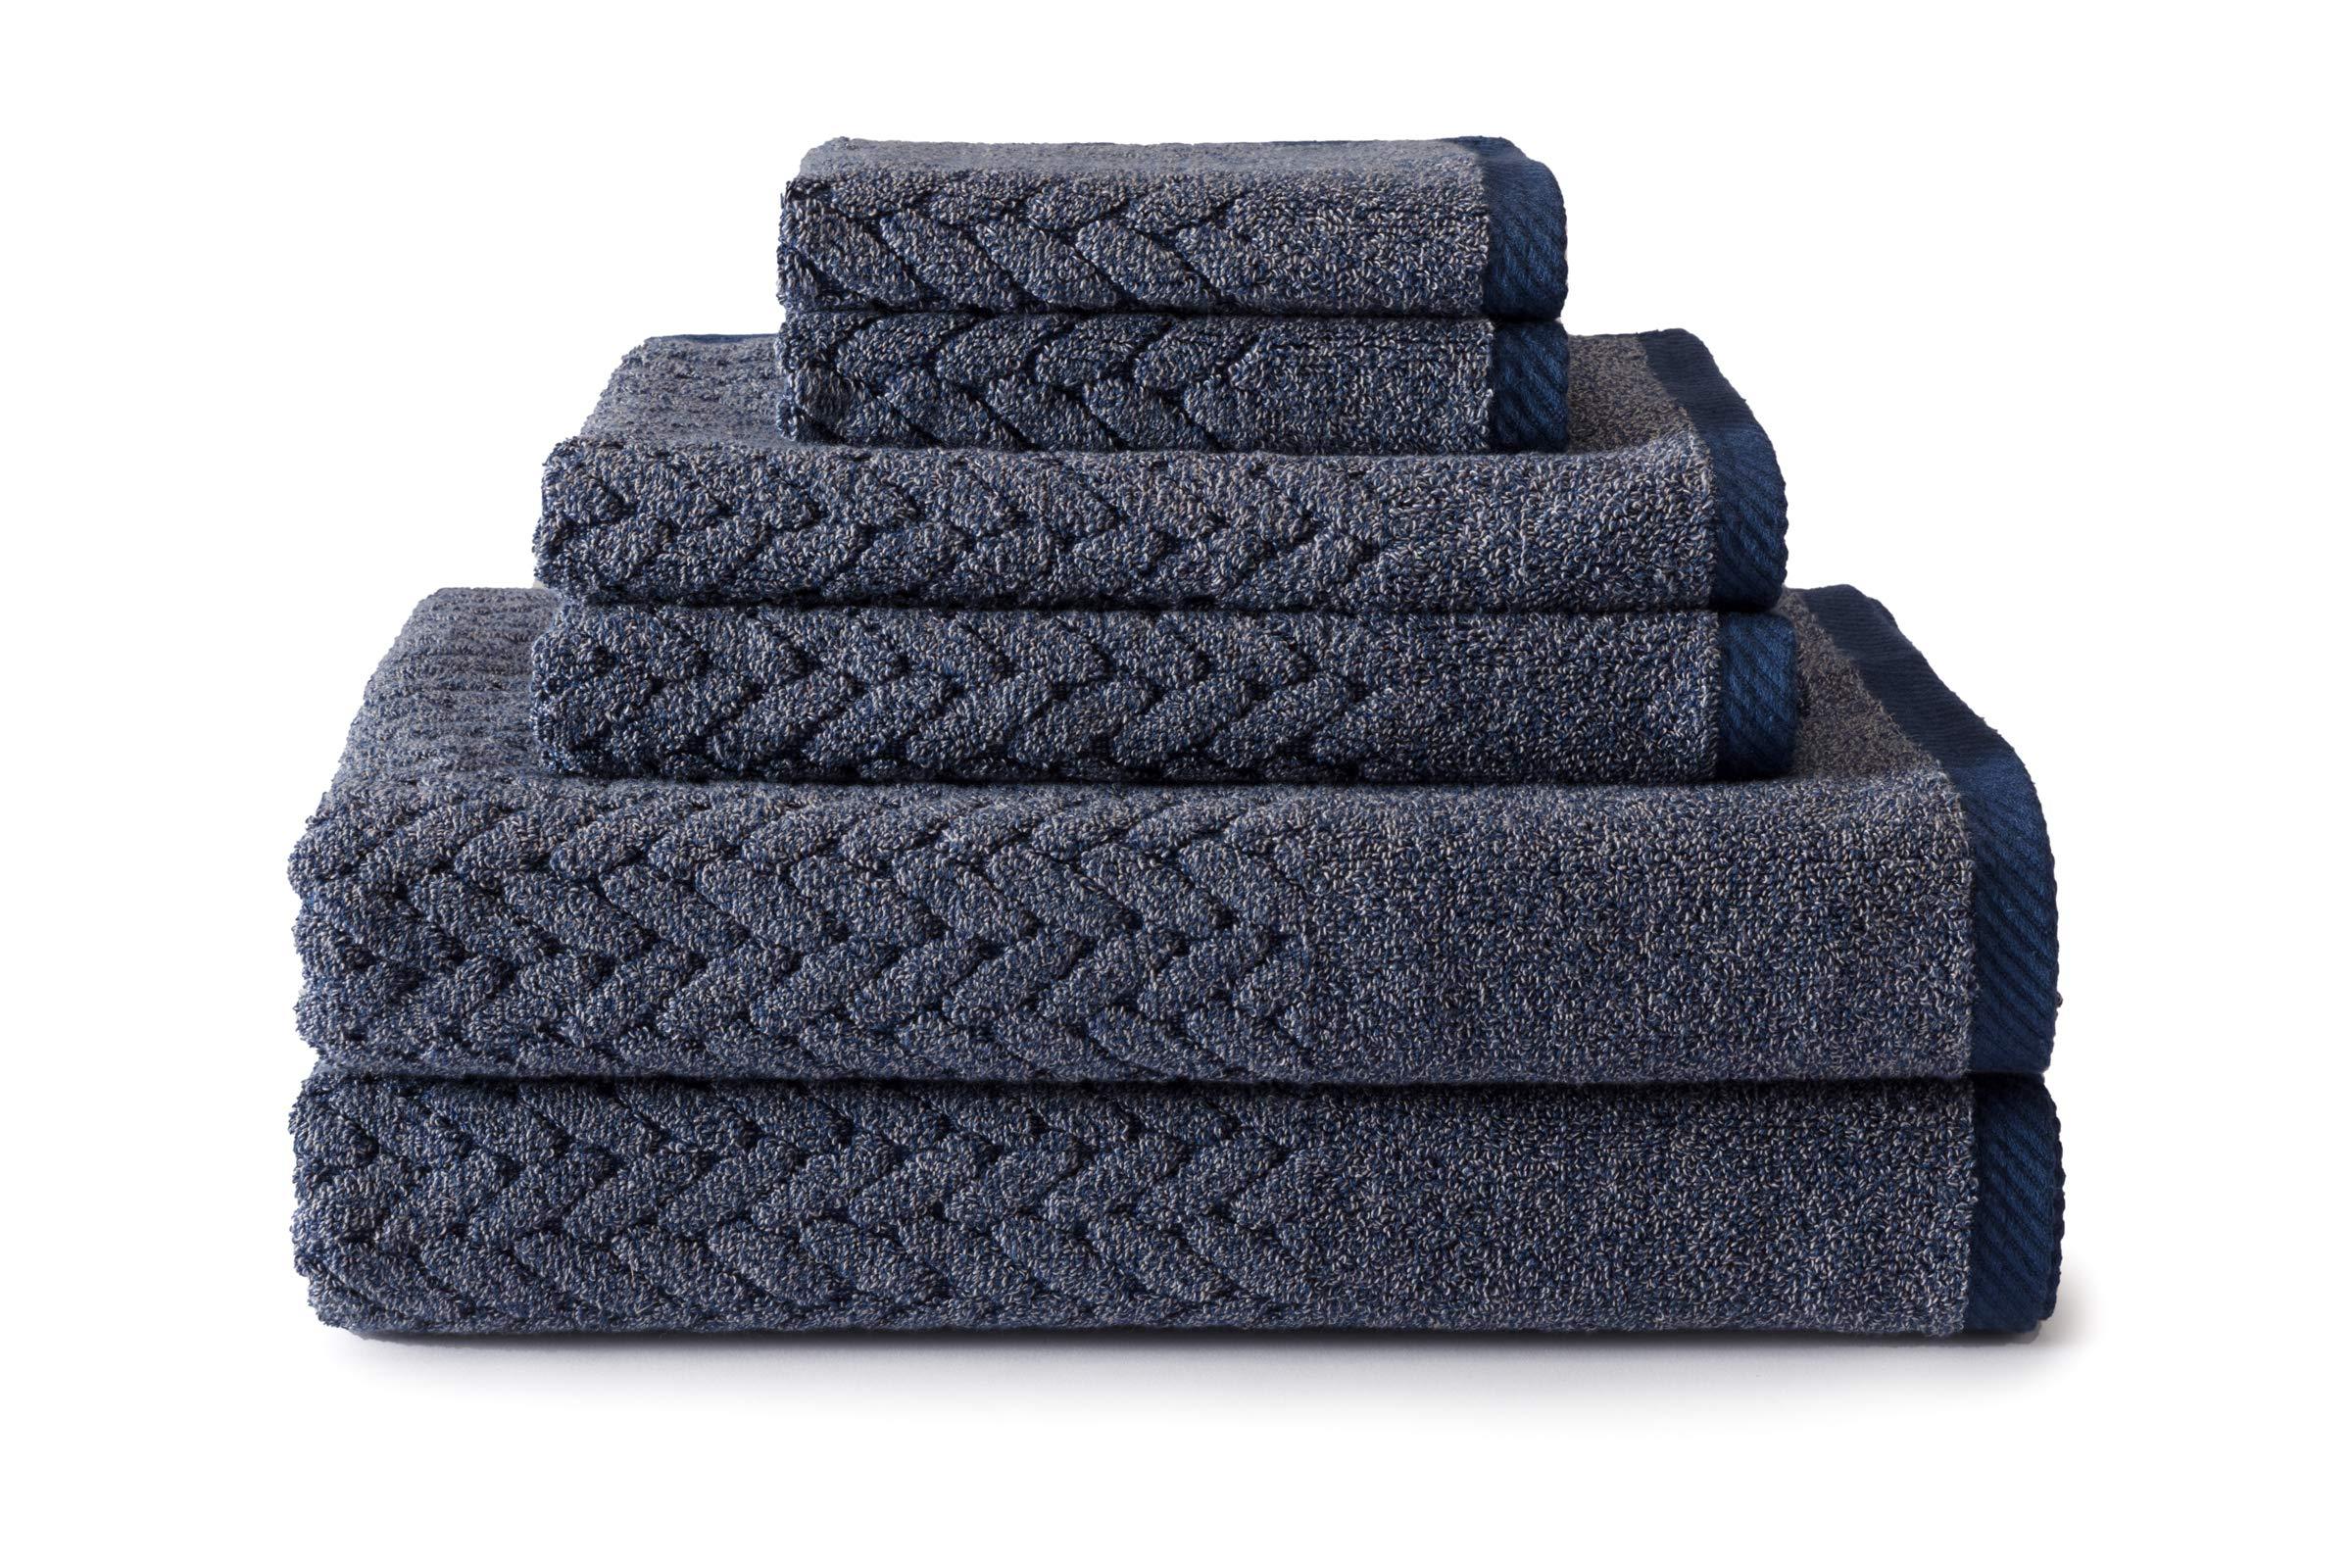 Texere 100% Organic Cotton 6-Piece Towel Set - Luxury Bath Towel (Chestnut, 6-Piece Set, Estate Blue) from Son TX-HC263-002-ESBU-R-6